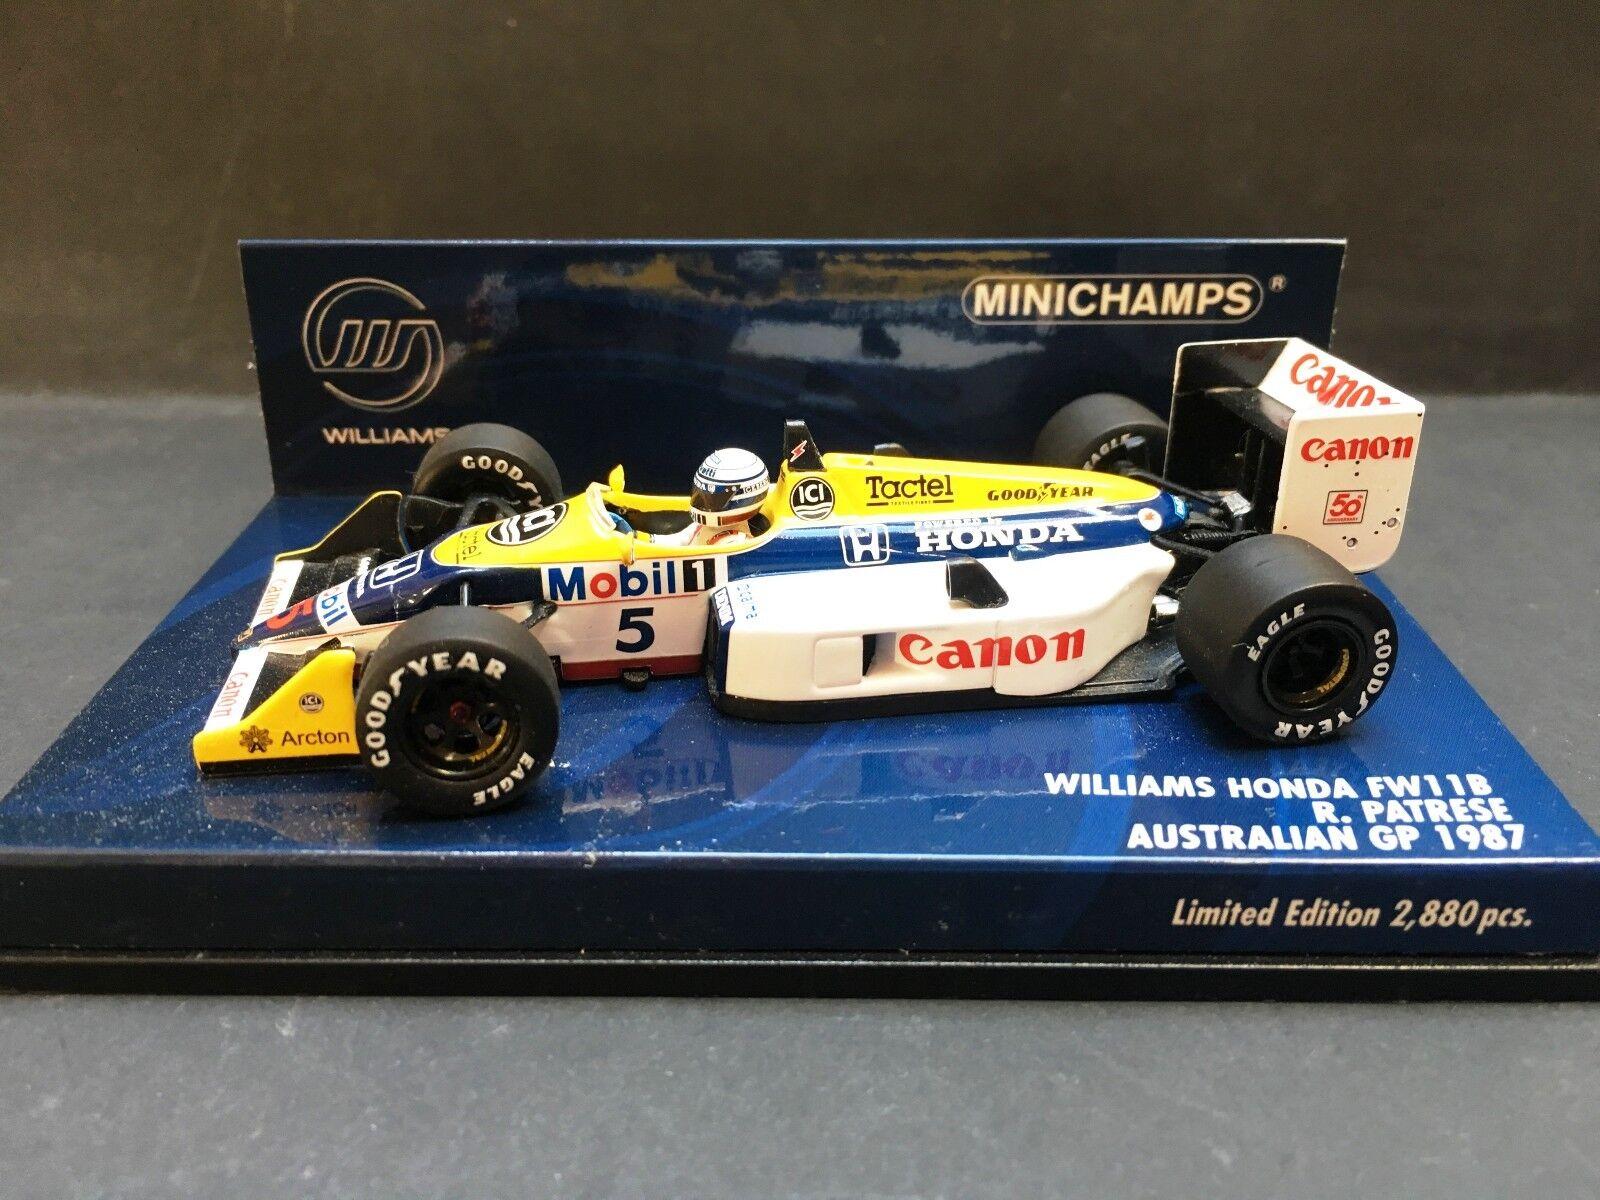 Minichamps - Ricardo Patrese - Williams - FW11B - 1987 - 1 43 - Australian GP